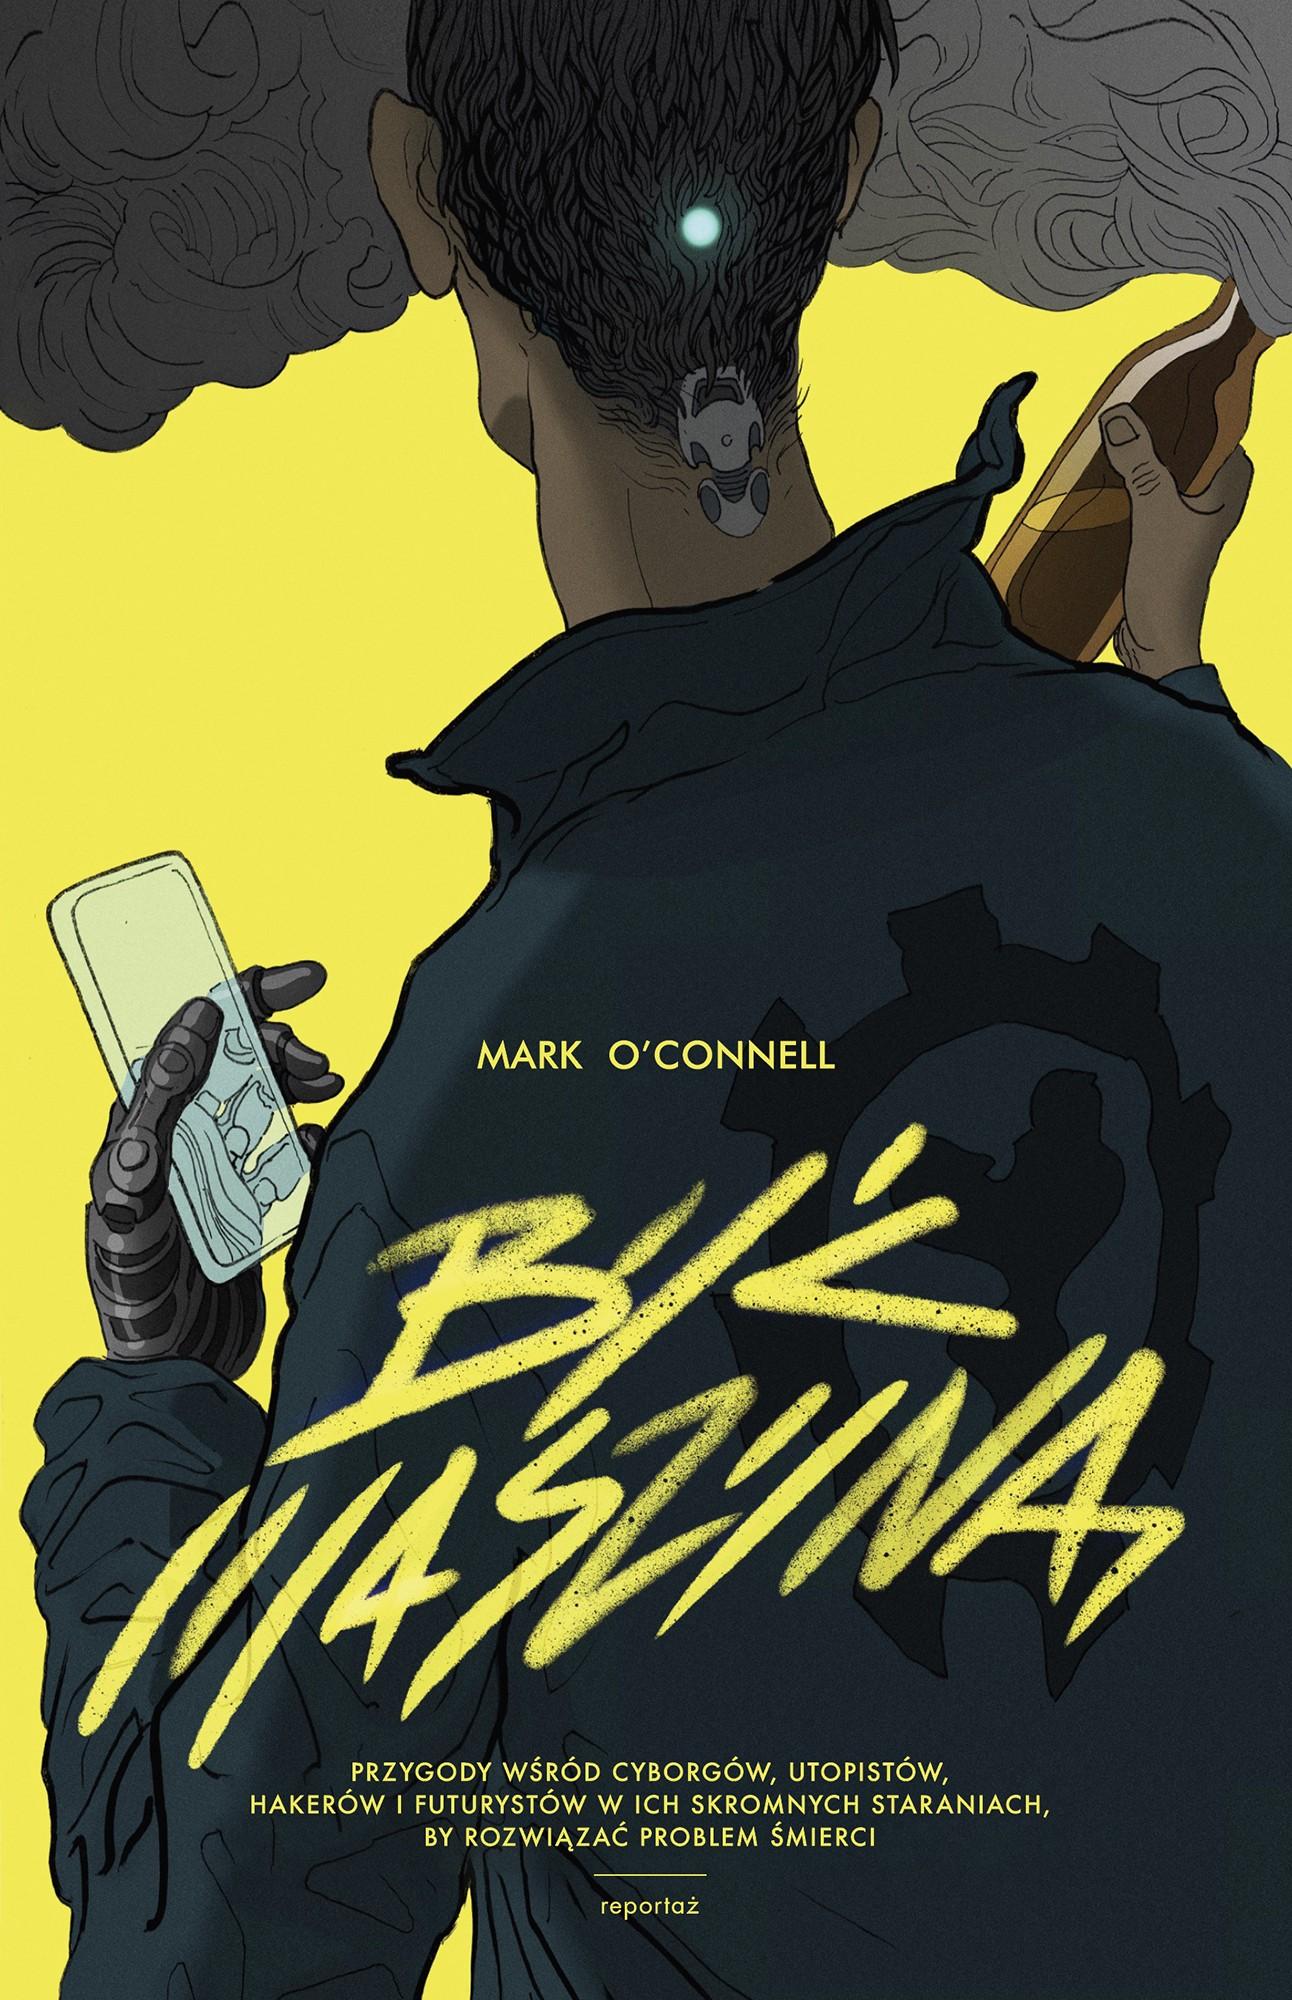 Marc O'Connell: Być maszyną